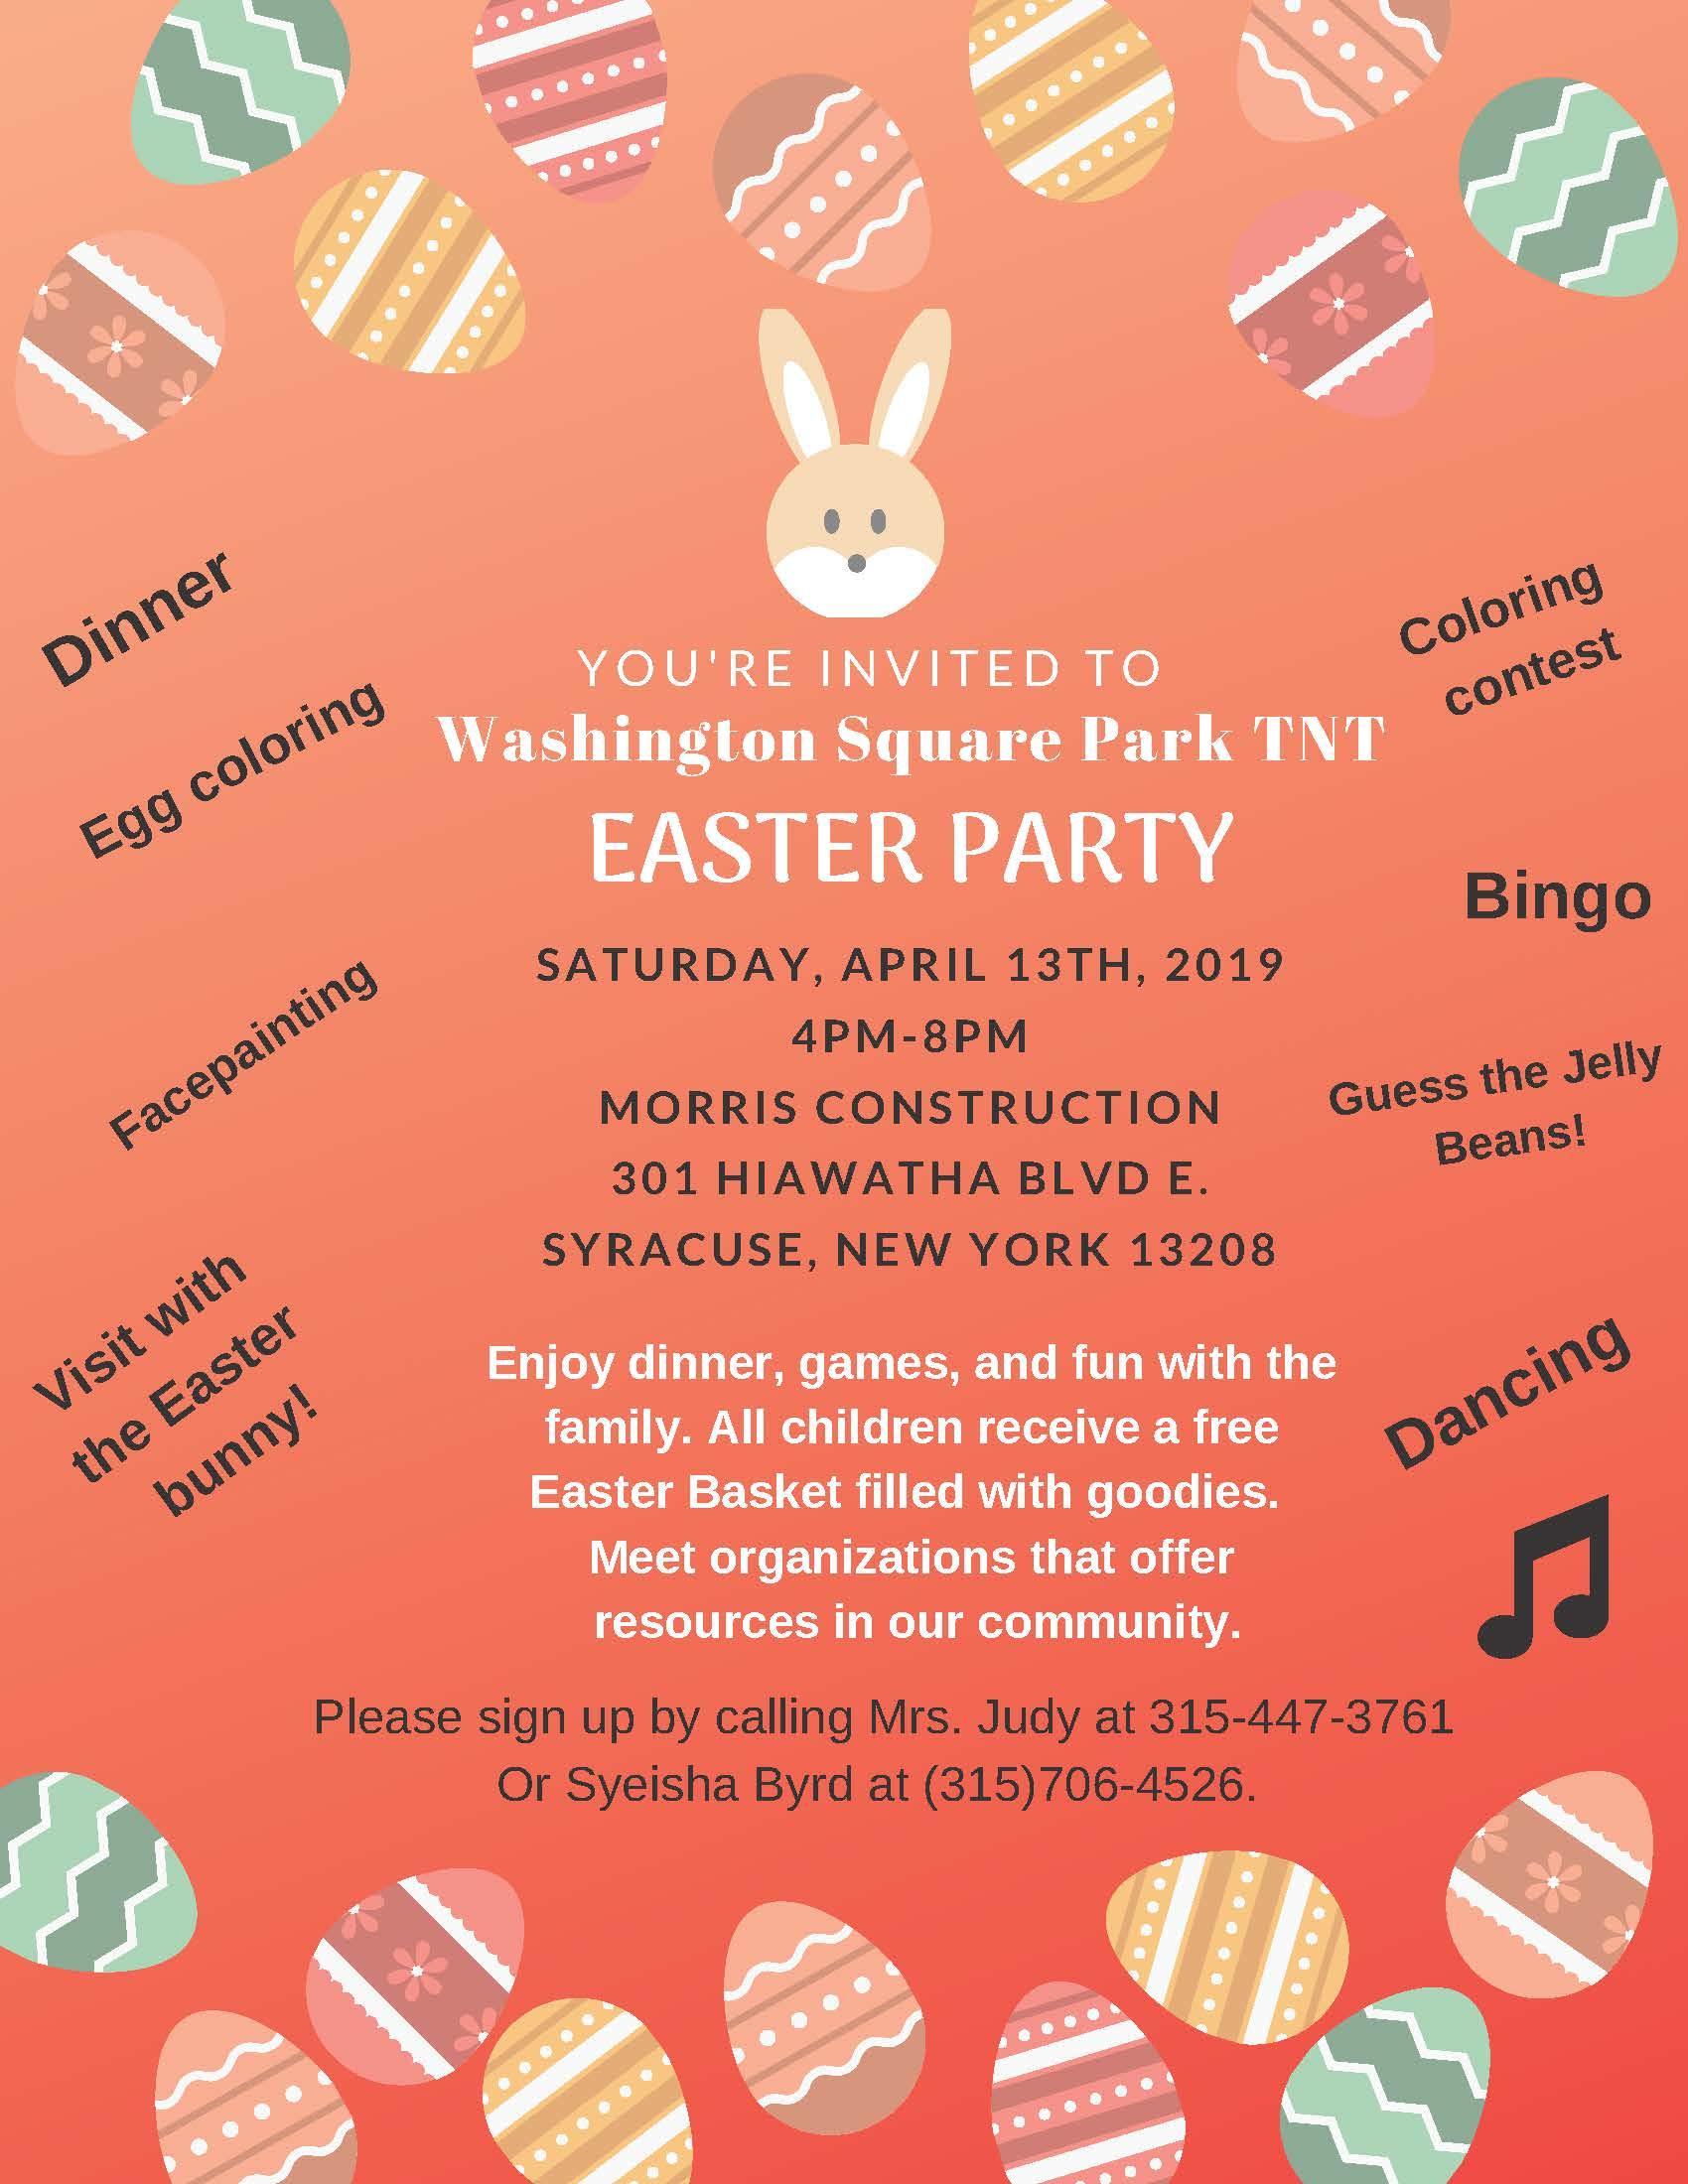 Easterparty flyer.jpg